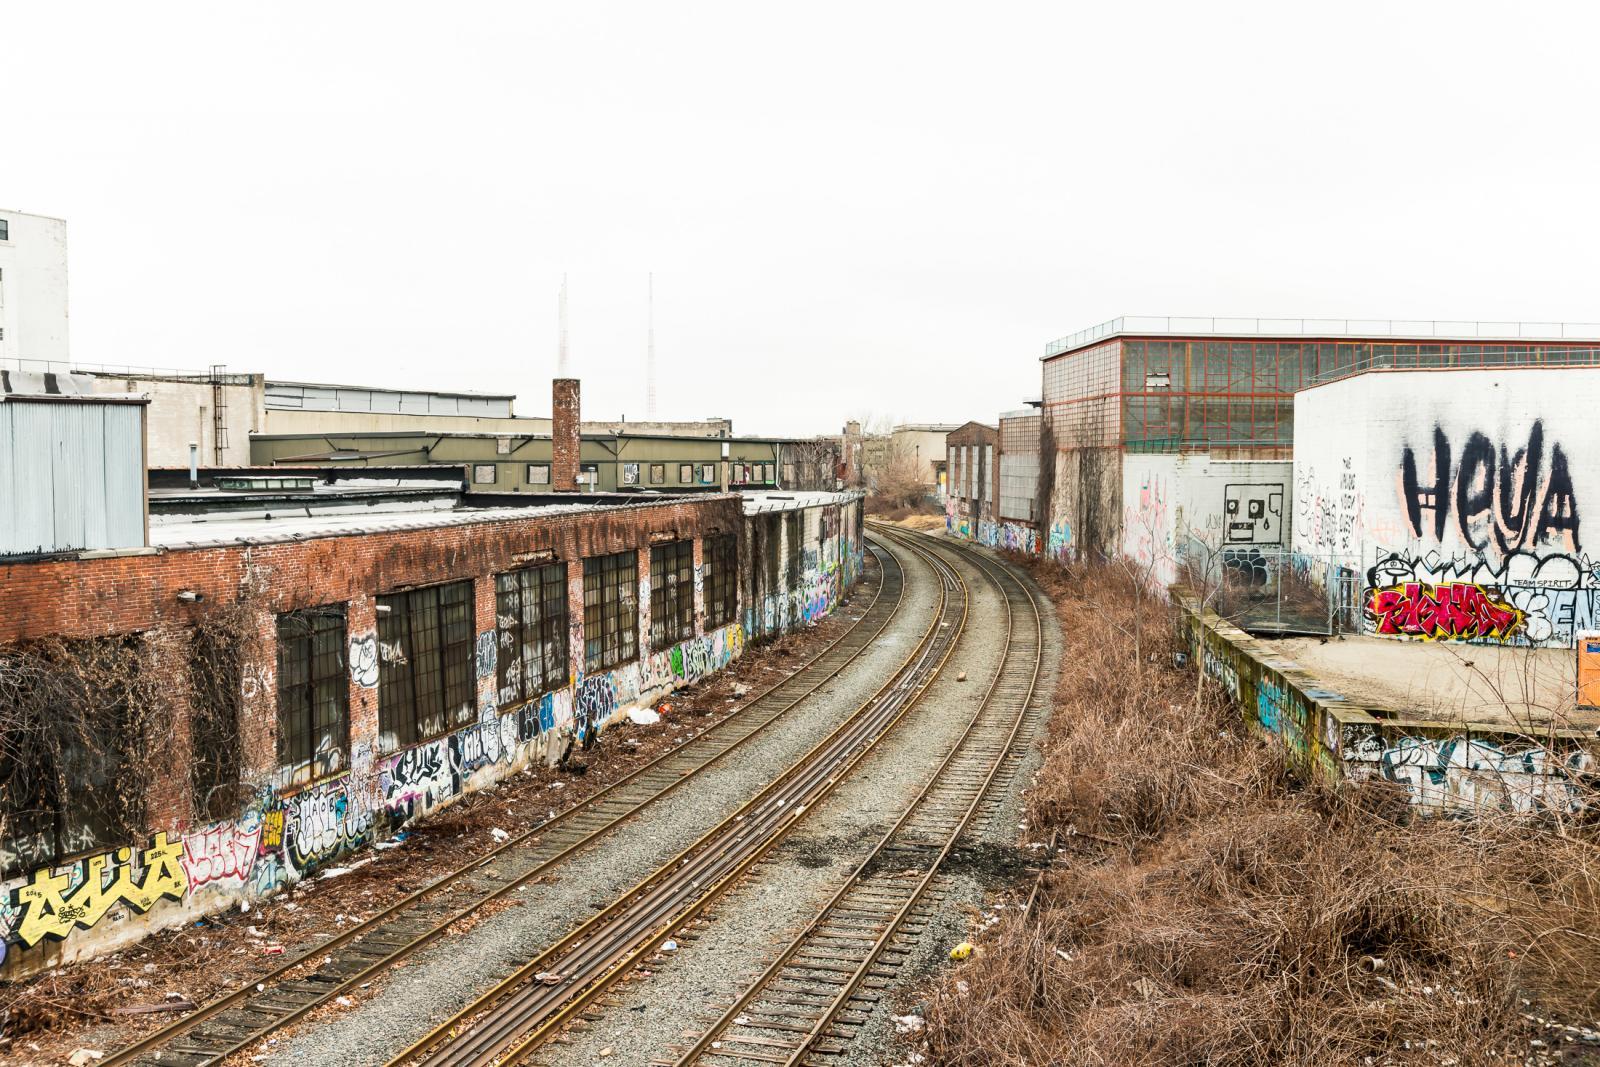 Bushwick, 2019